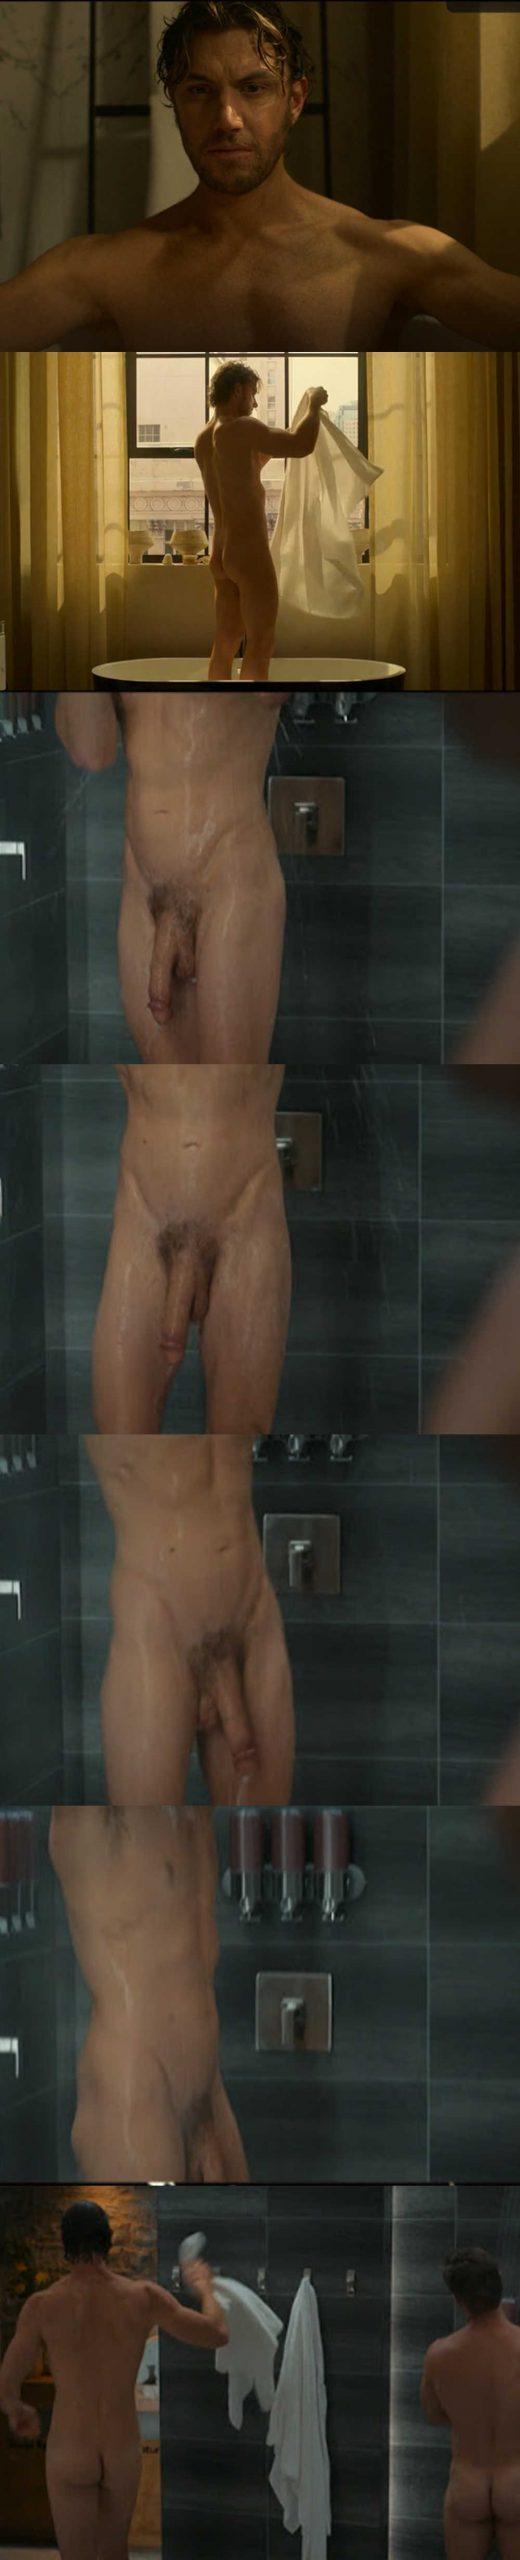 actor adam demos naked